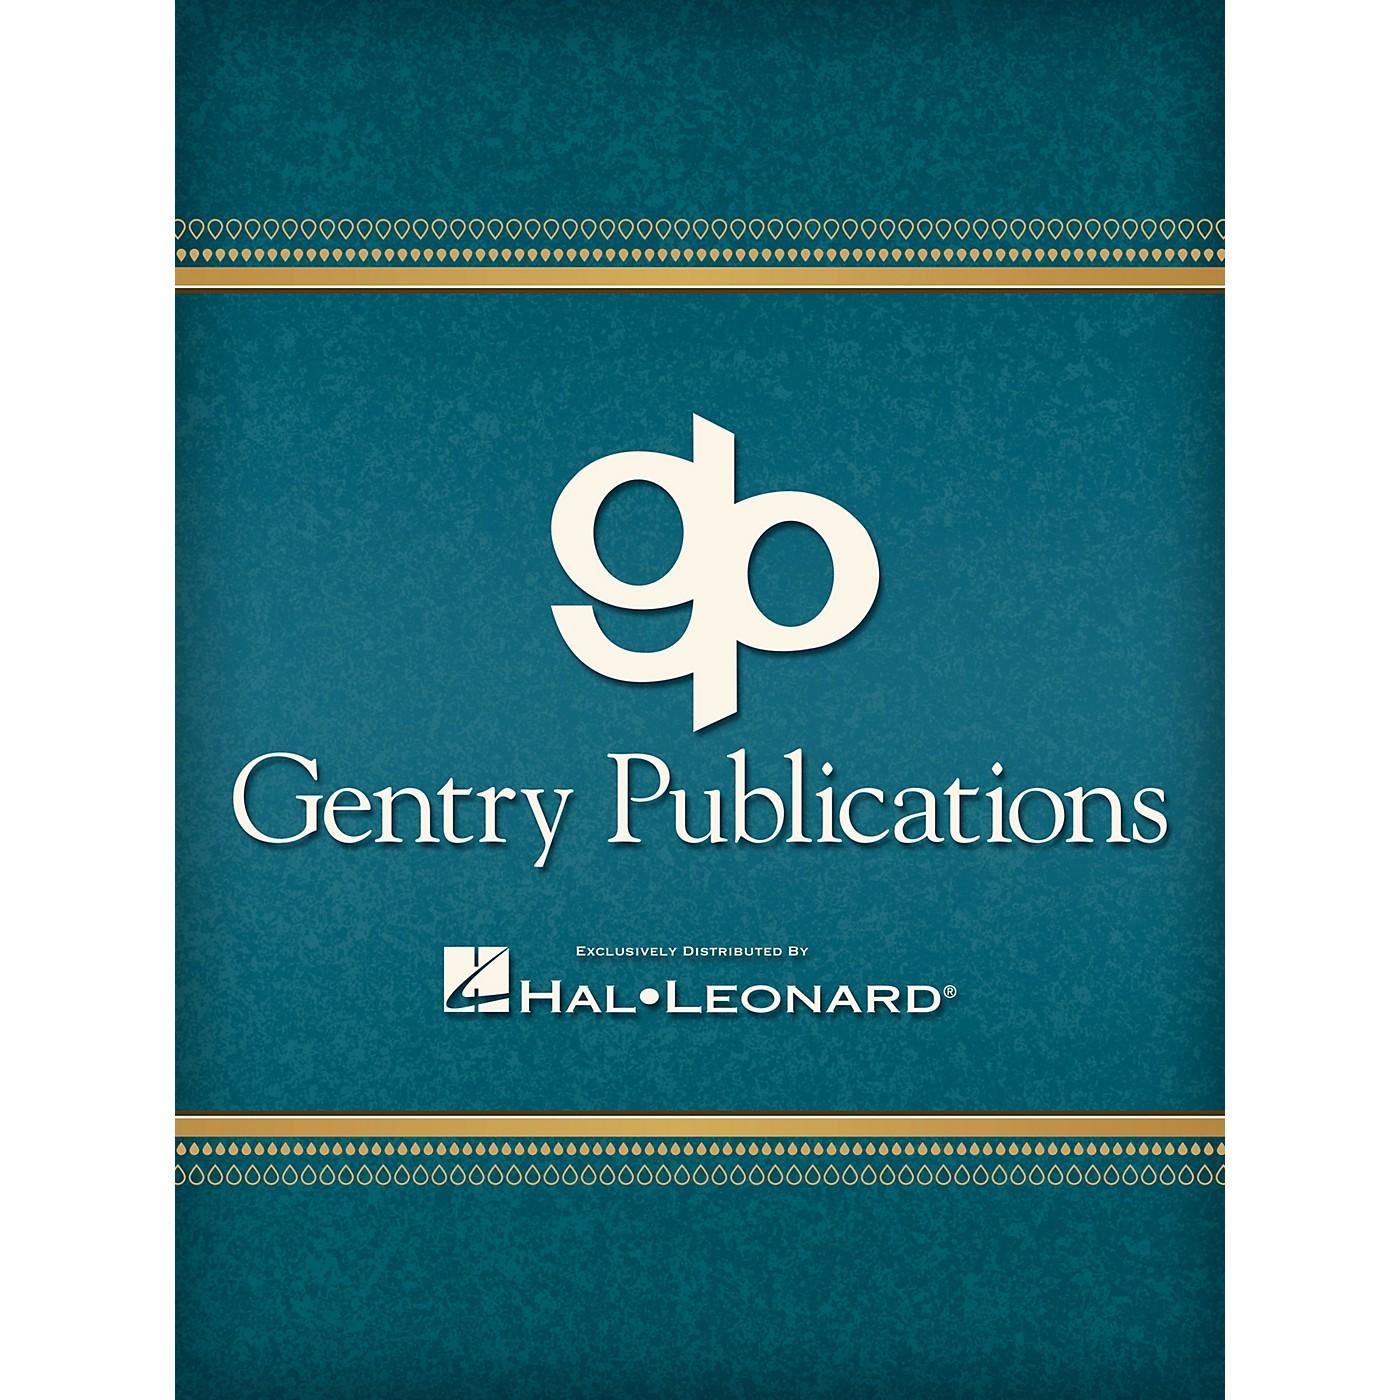 Hal Leonard He Comes At Christmastide Perf Cd CD ACCOMP thumbnail